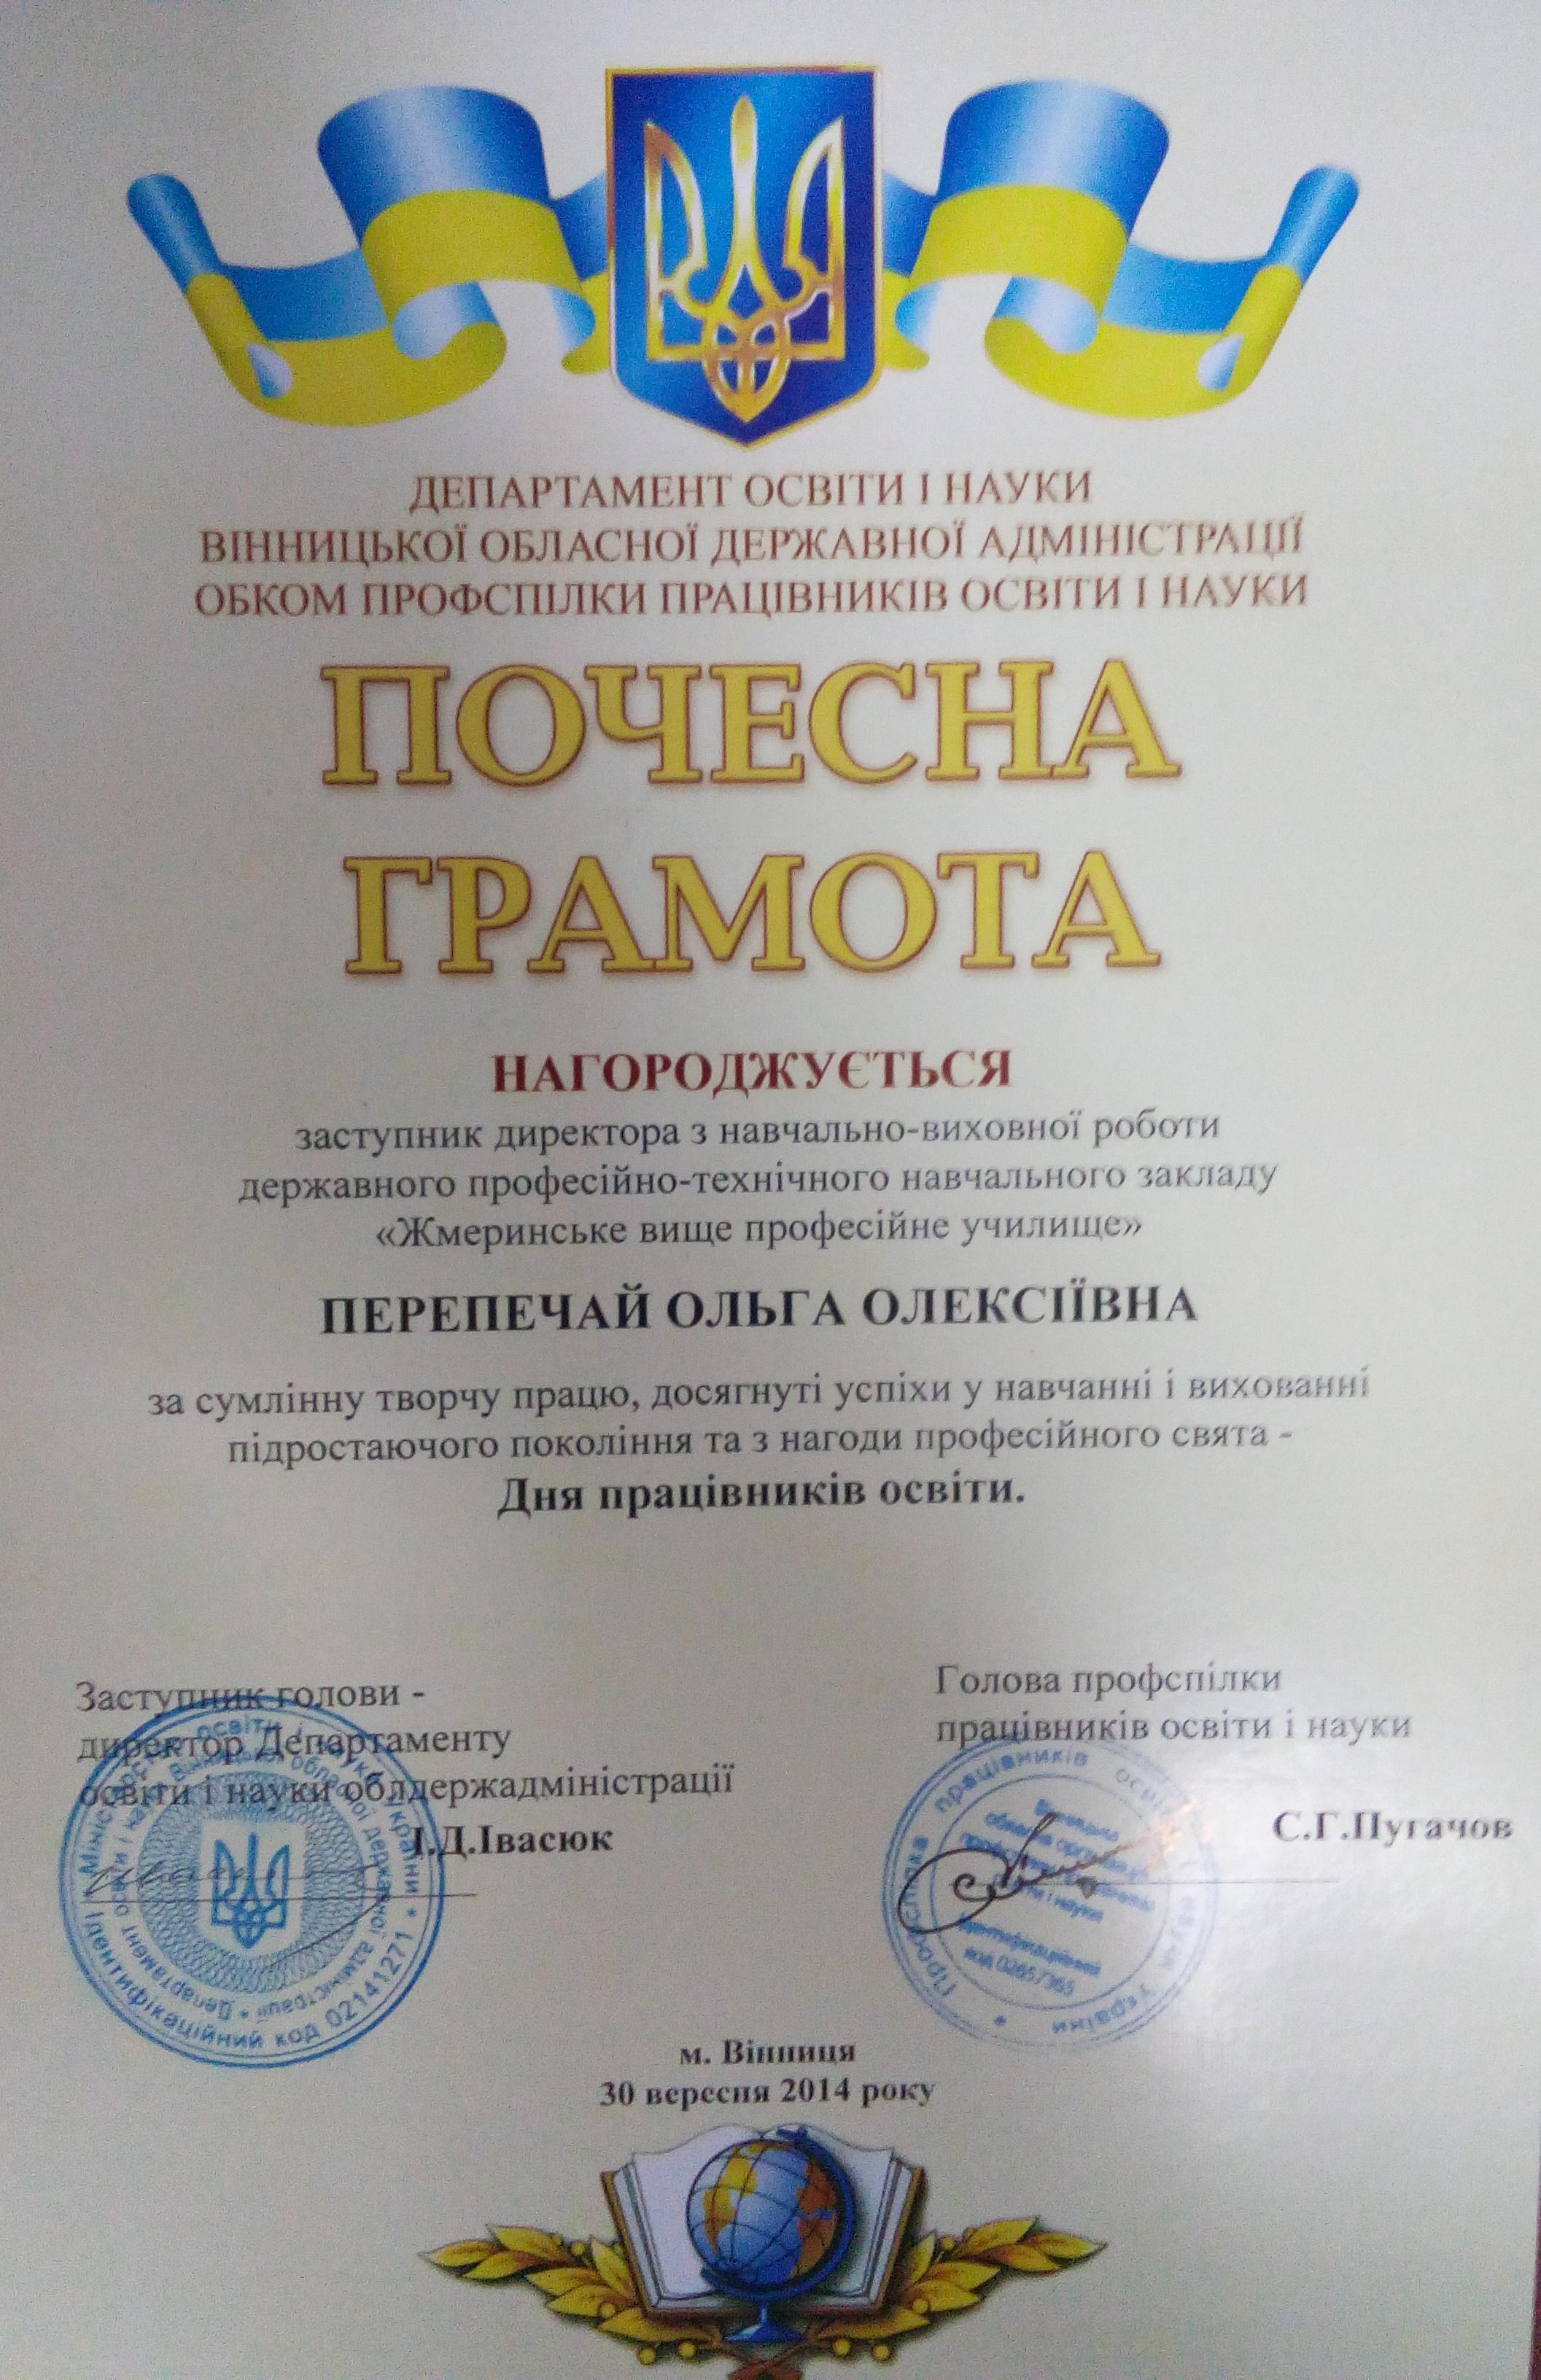 20151211_115801